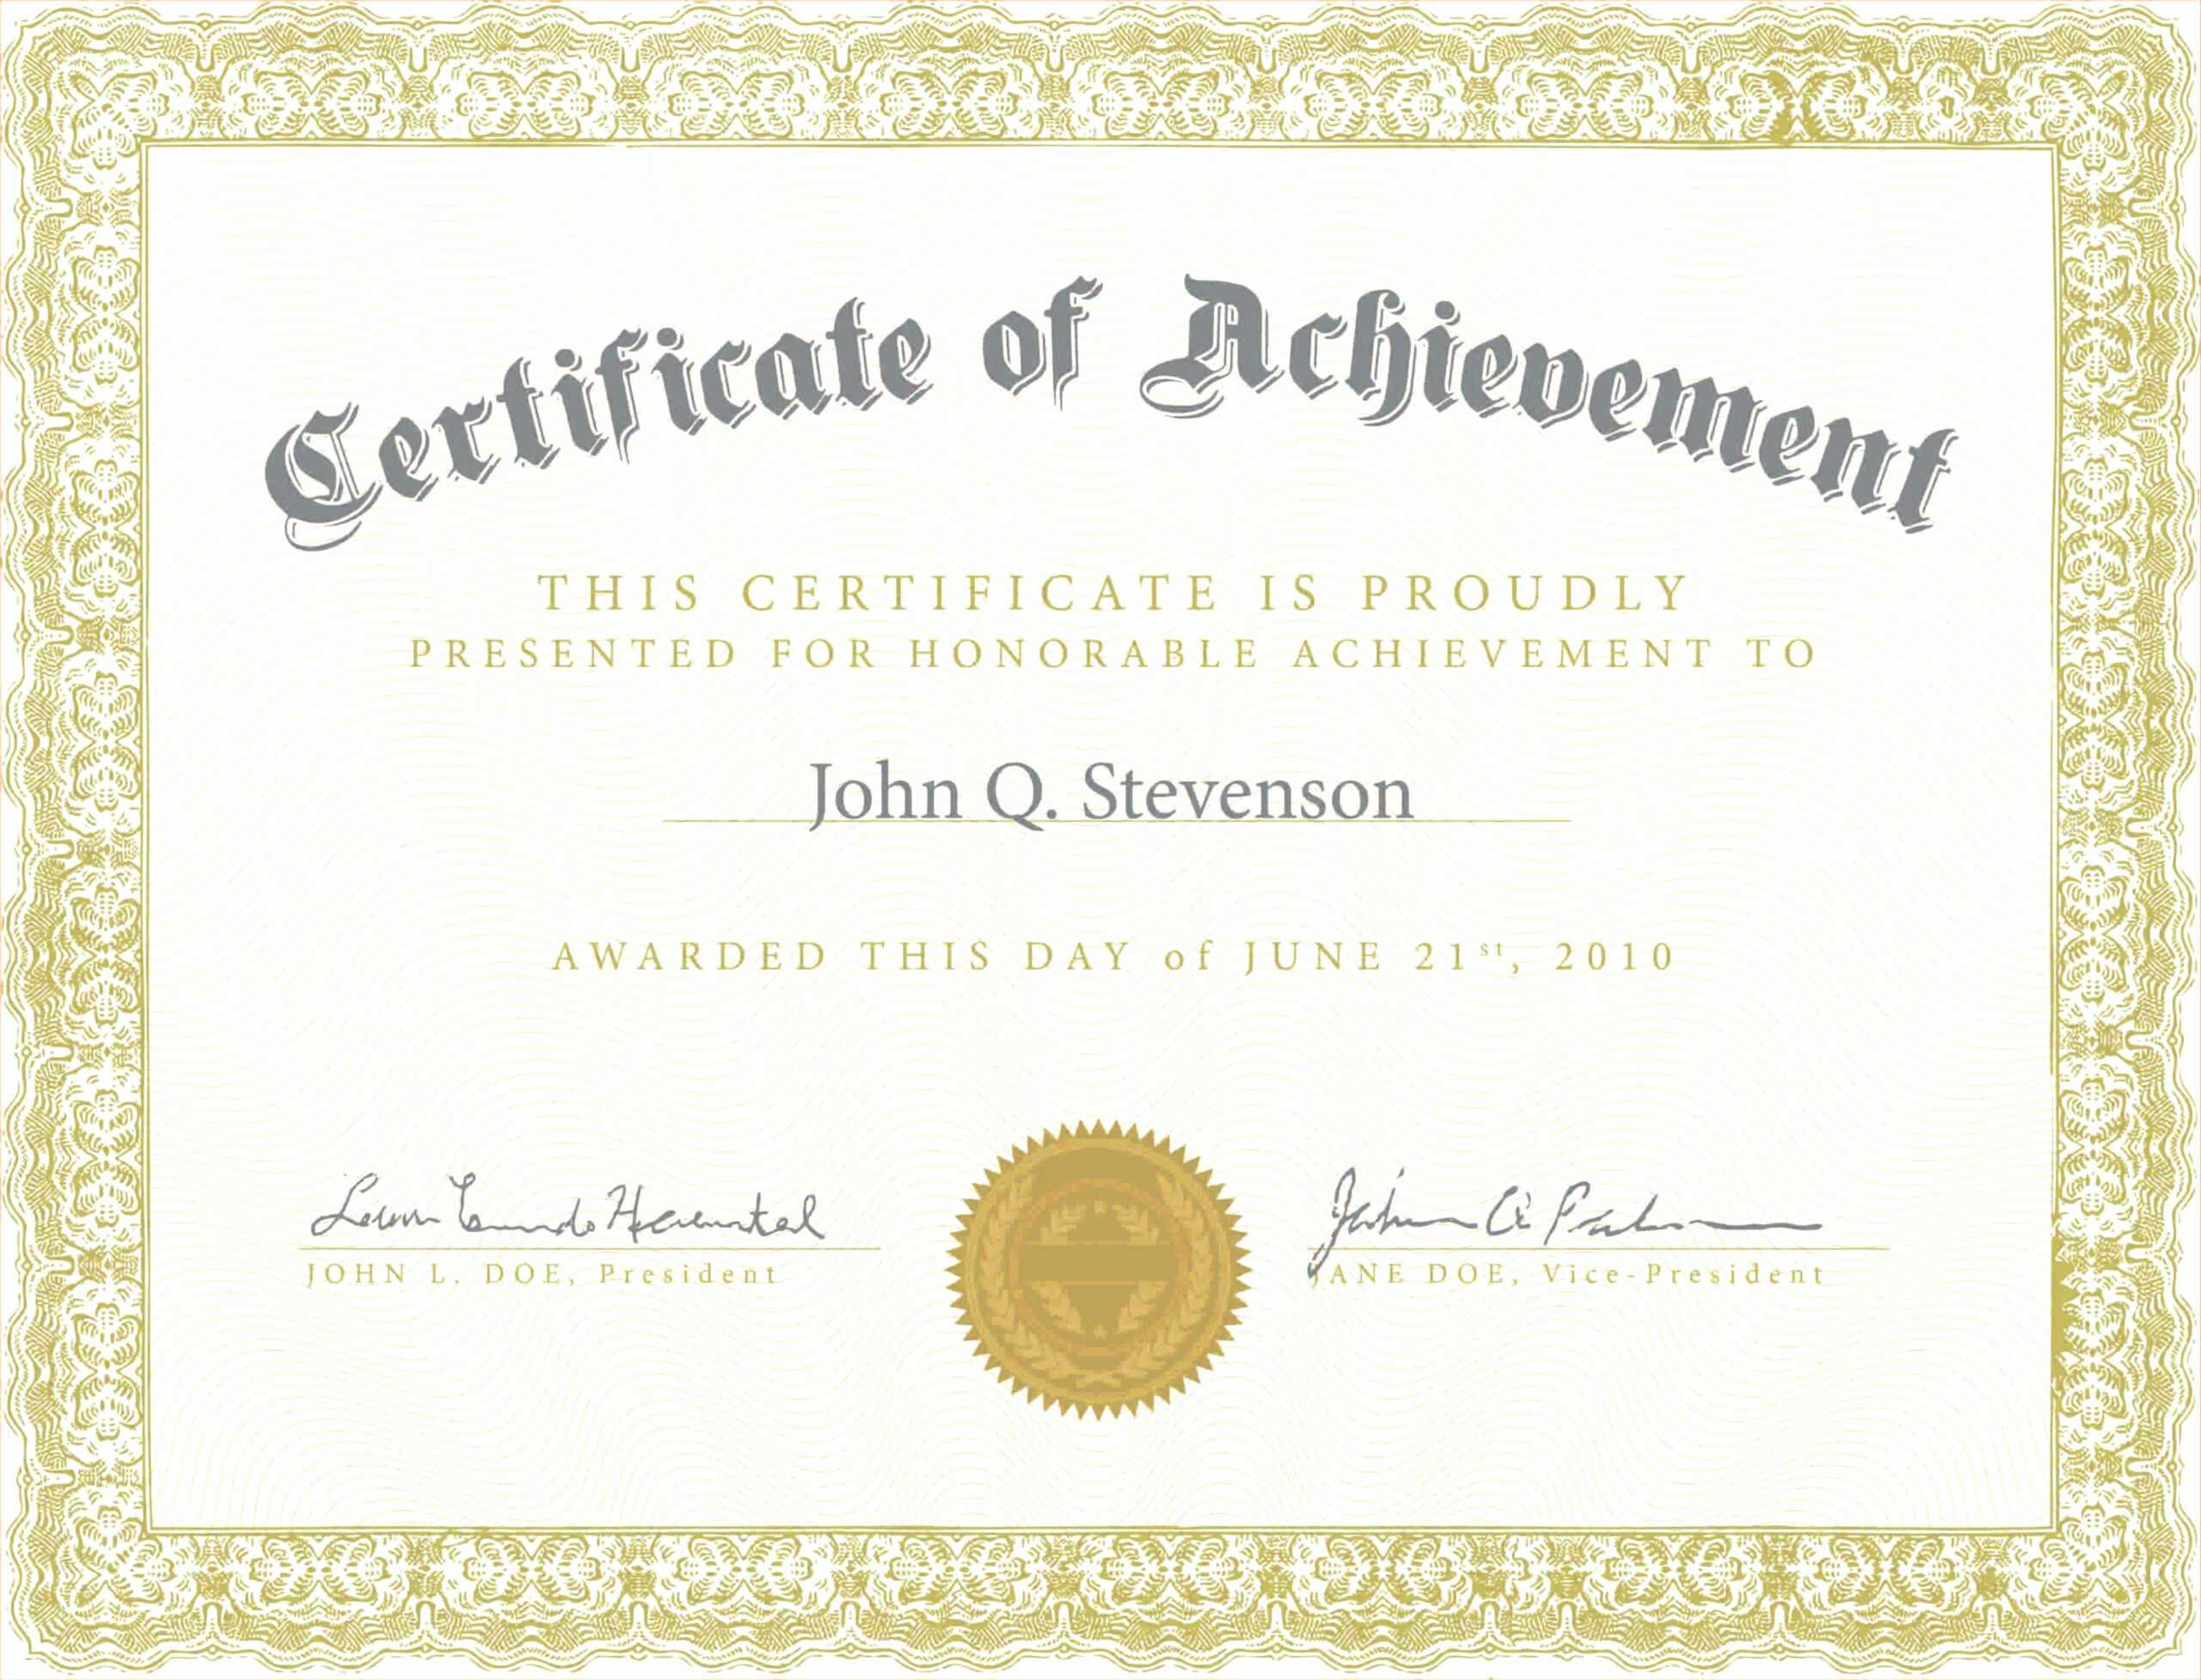 004 Army Certificate Of Appreciation Template Pdf Ideas Within Army Certificate Of Appreciation Template